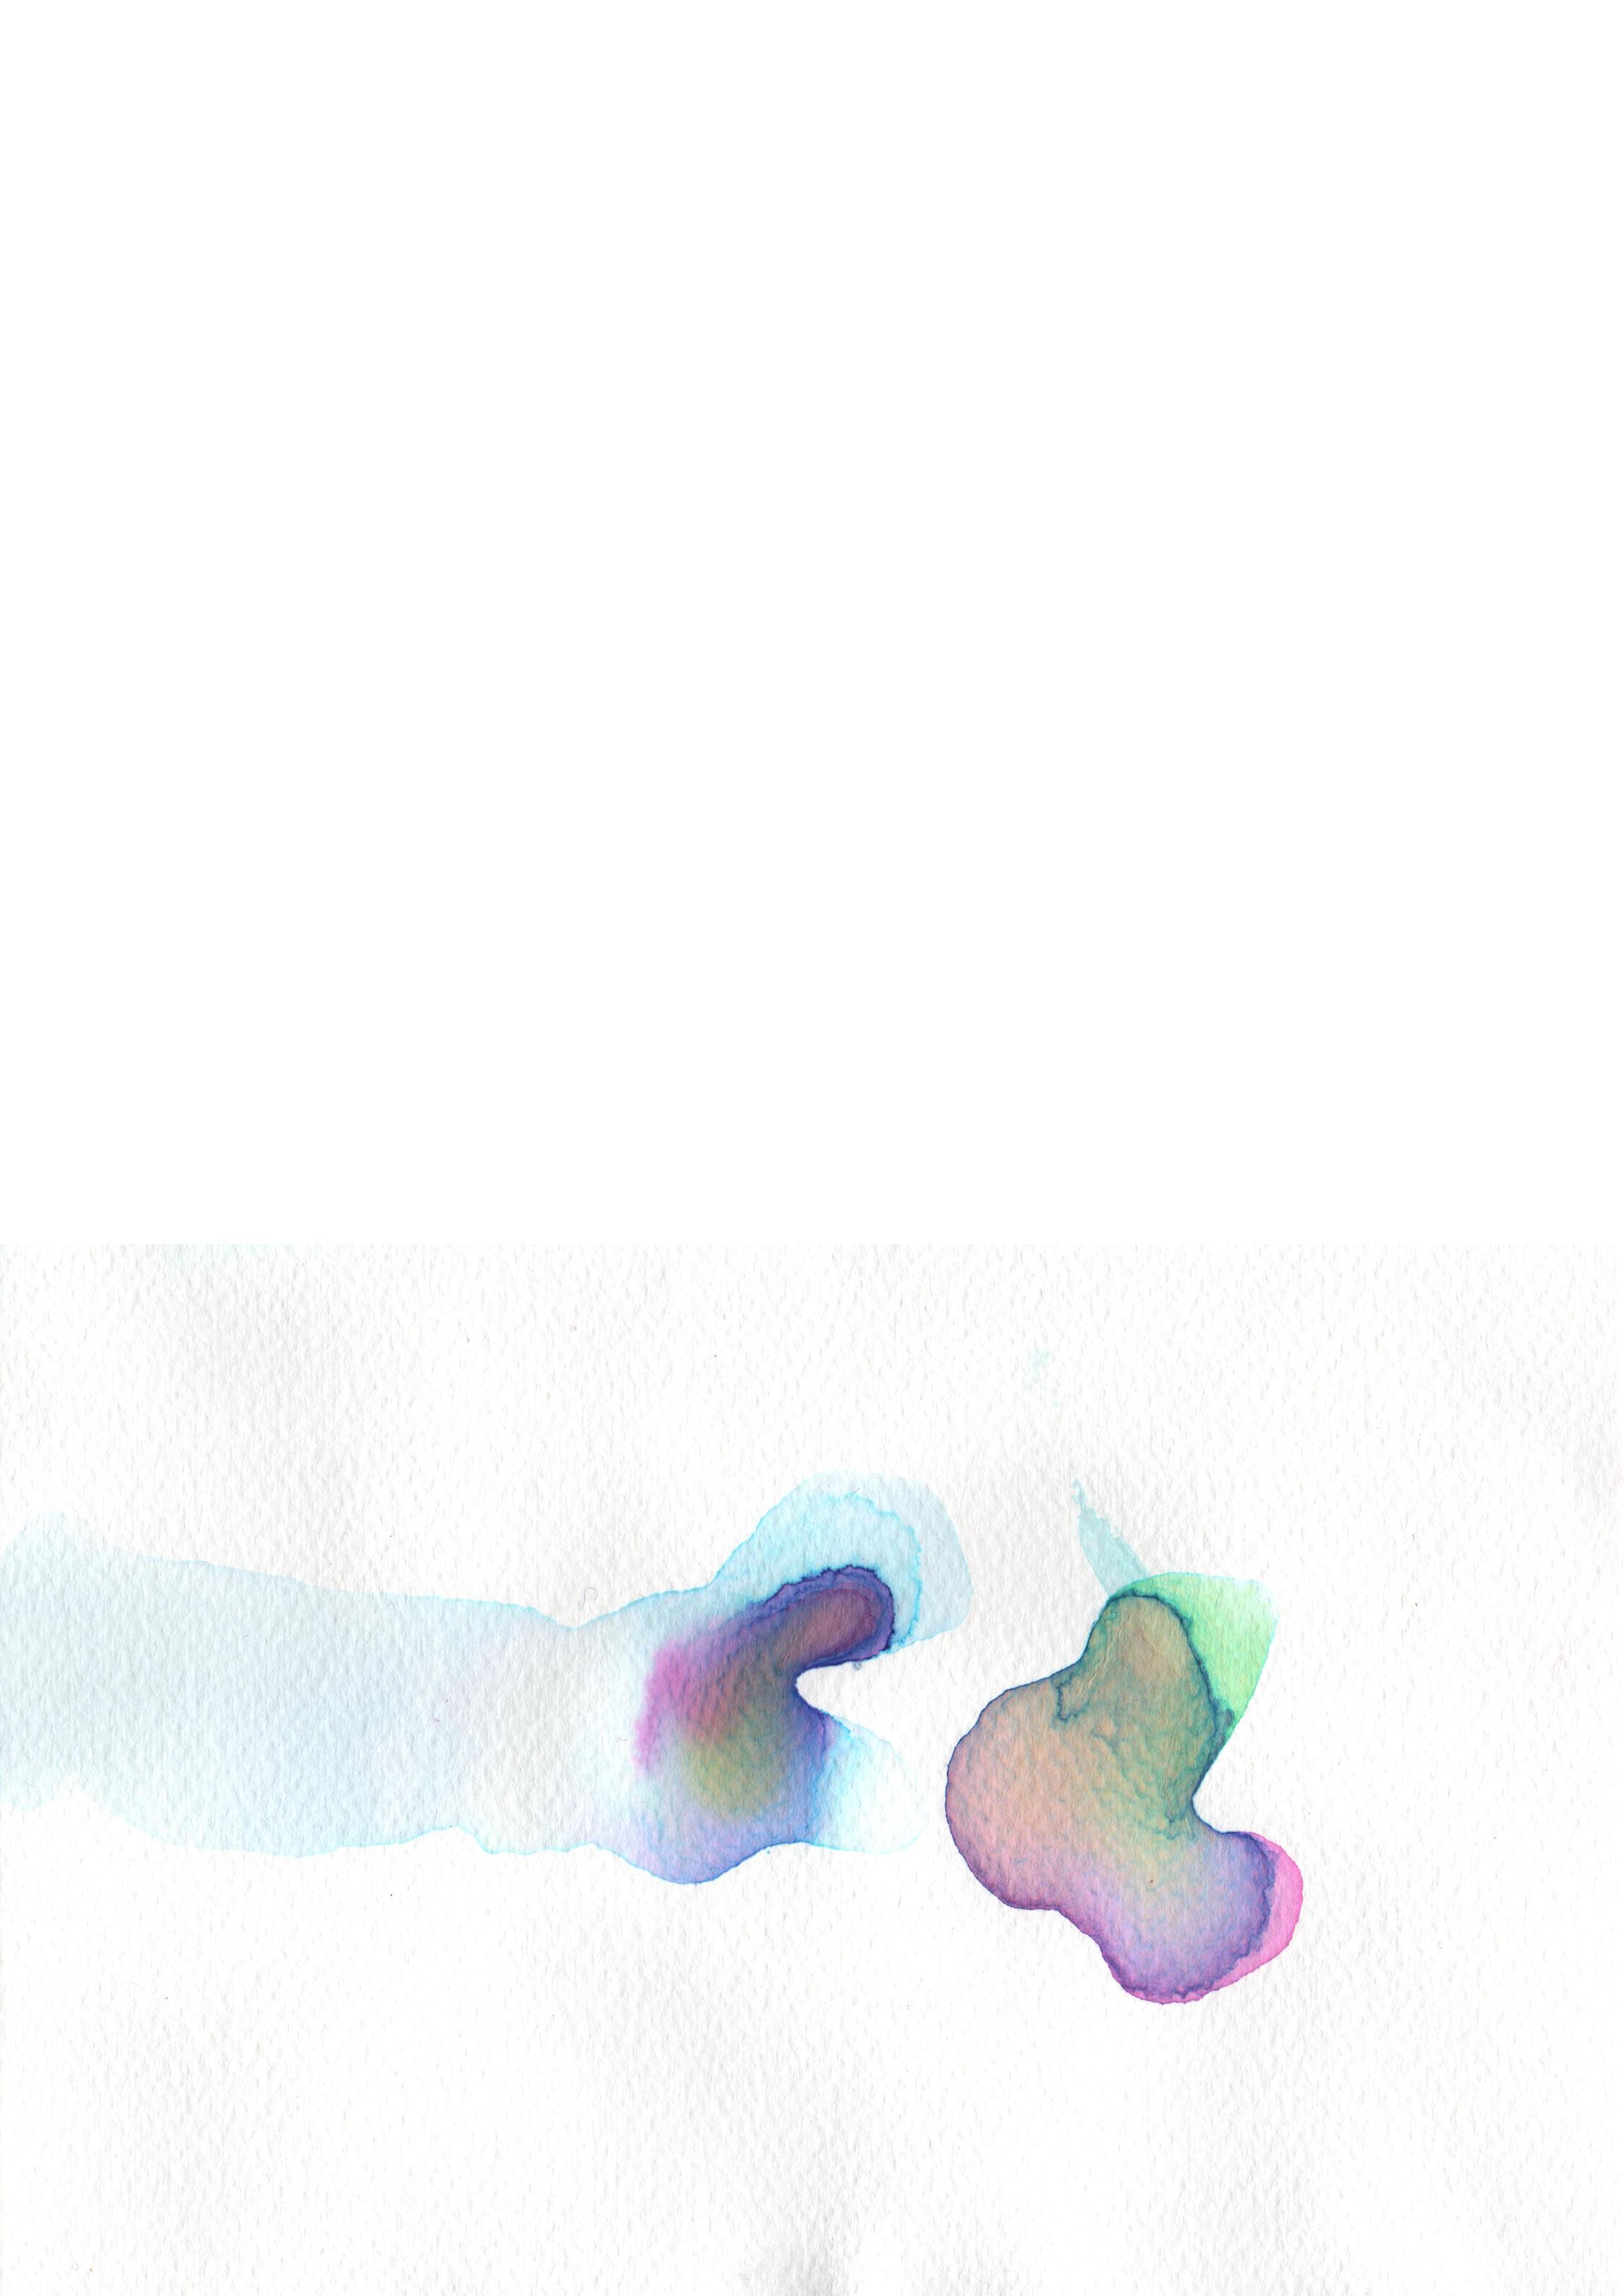 2.s t jpg.jpg